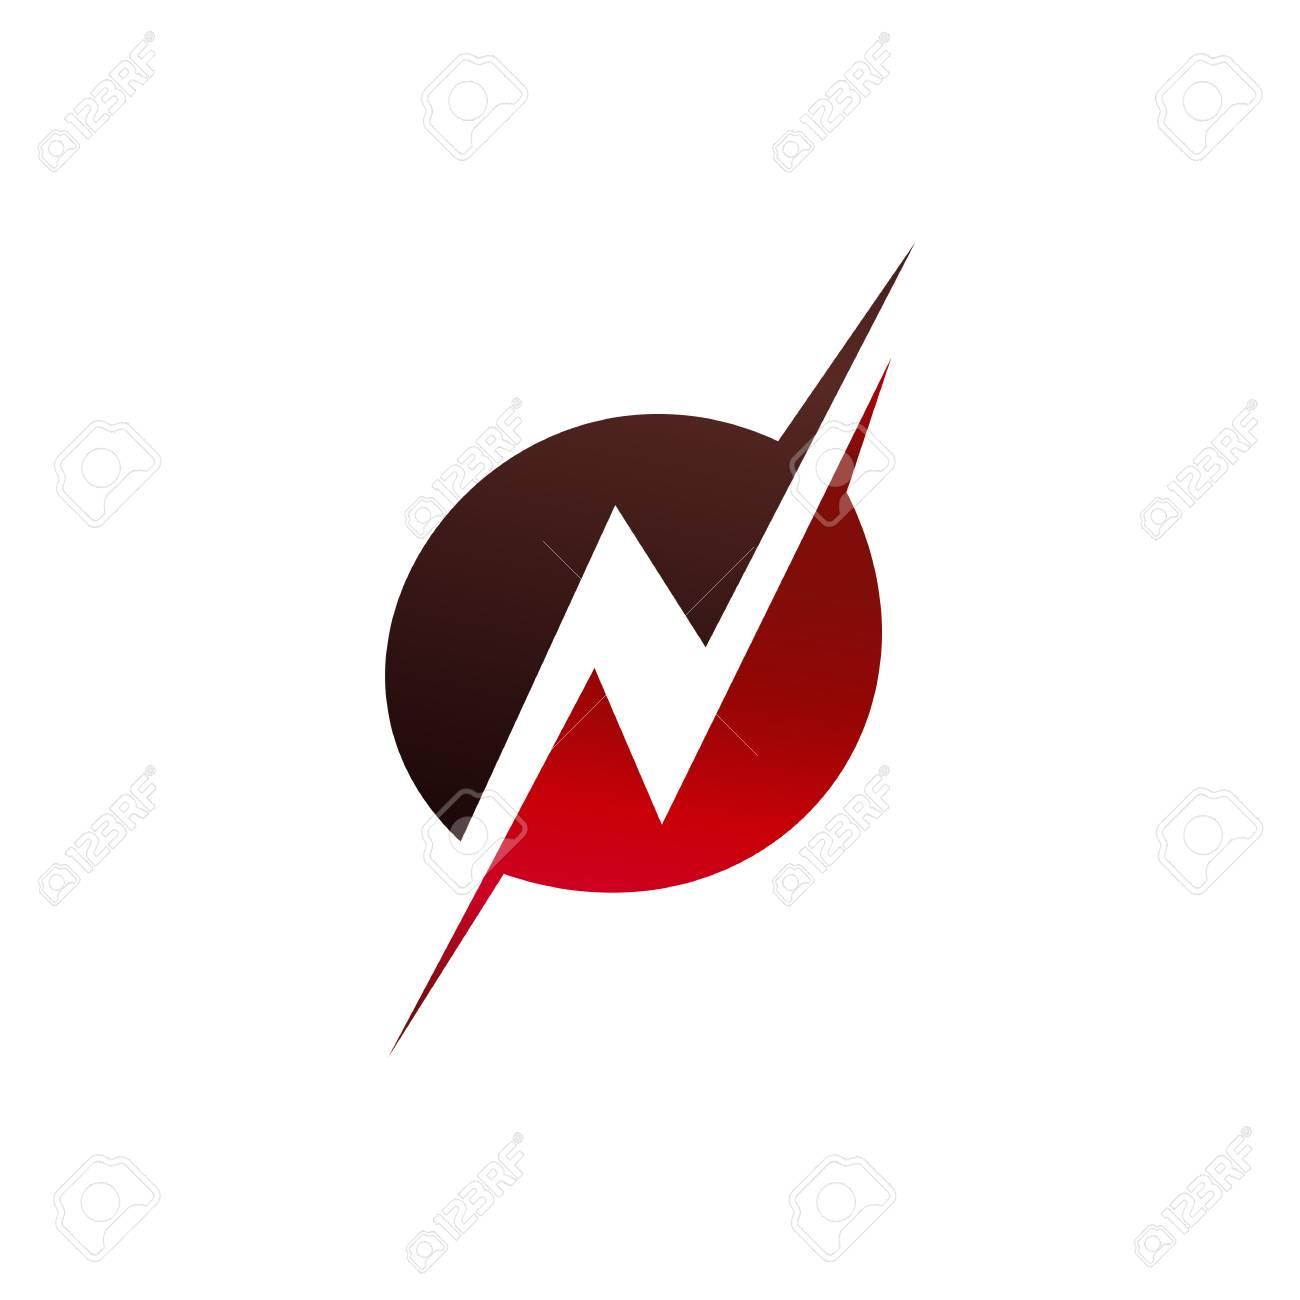 Letter N Logo Design Concept Template Royalty Free Cliparts Vectors